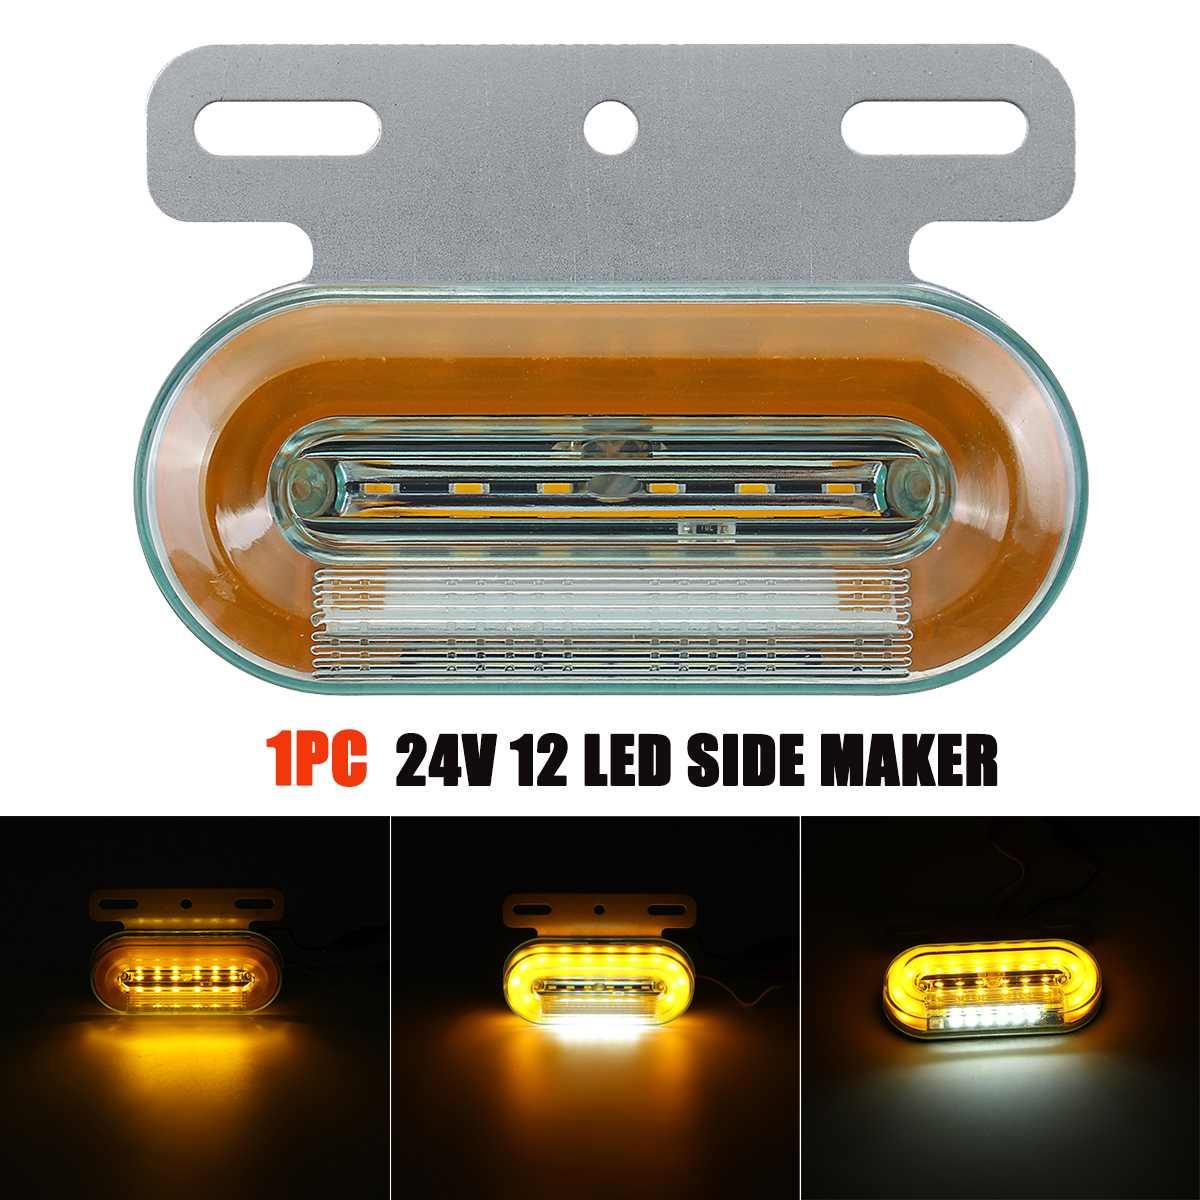 24V 12 LED Side Marker Lights Car External Lights Signal Indicator Lamps Warning Tail Light 3 Modes Trailer Truck Lorry